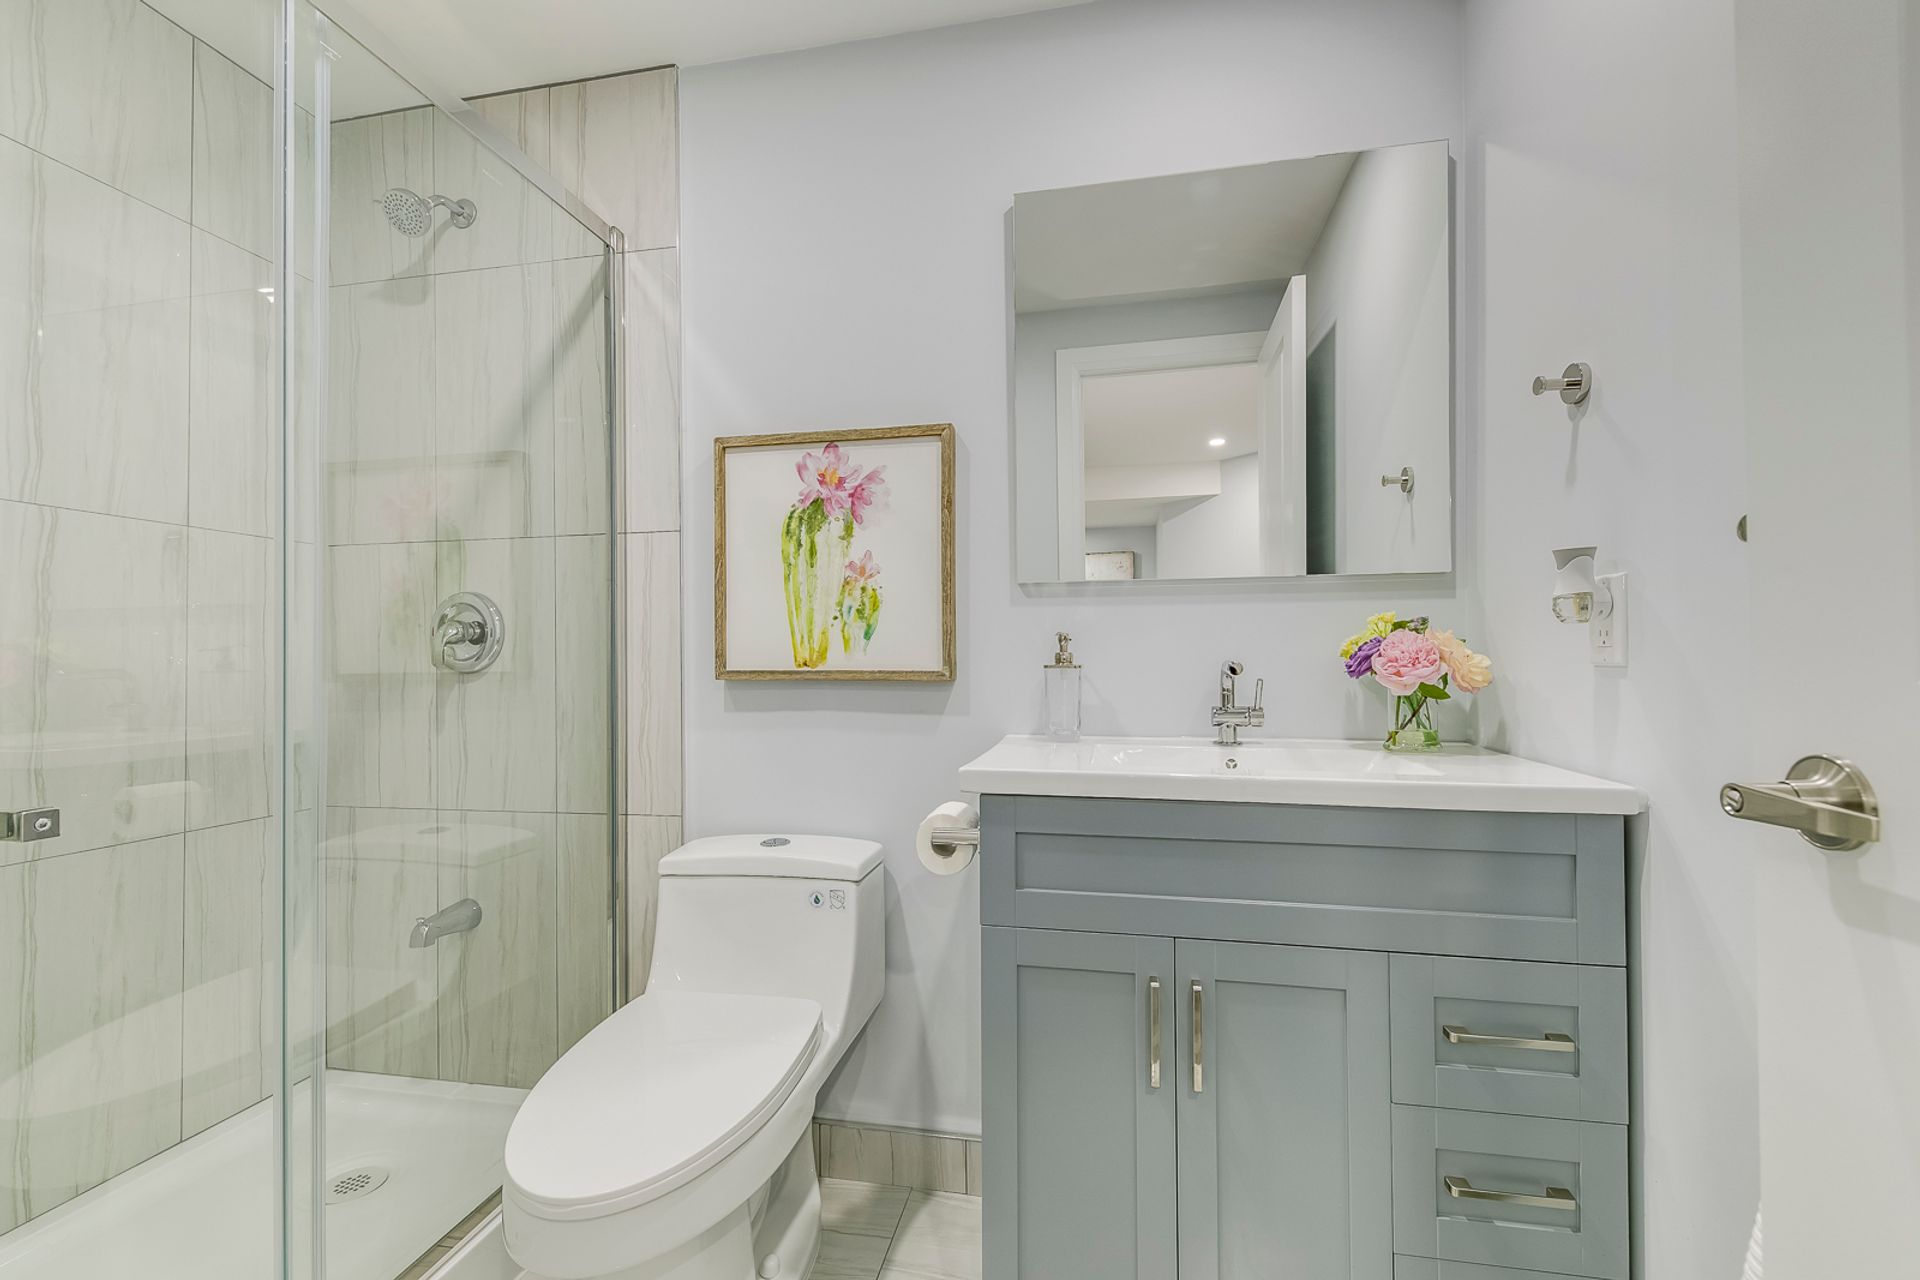 Basement Bathroom - 3129 Riverpath Common, Oakville - Elite3 & Team at 3129 Riverpath Common, Rural Oakville, Oakville